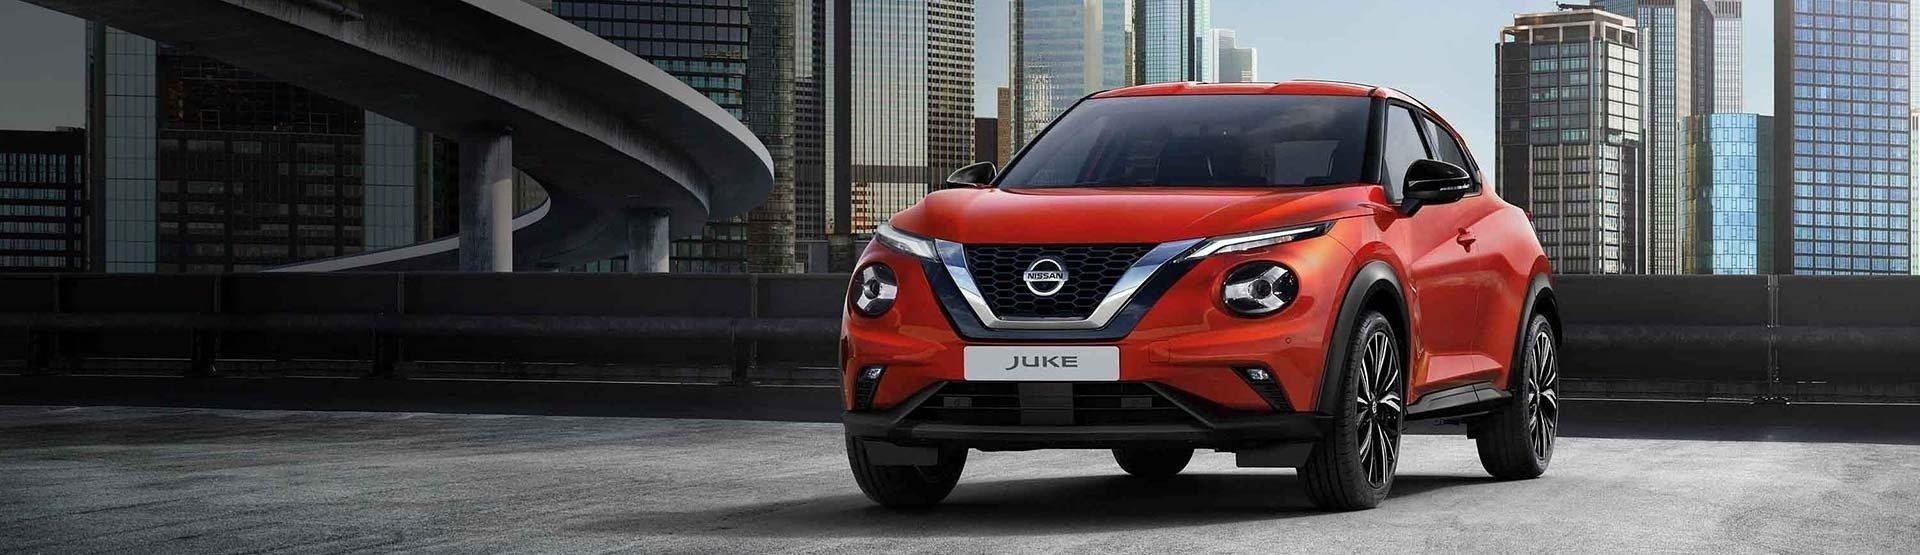 Werribee Nissan - Nissan Juke